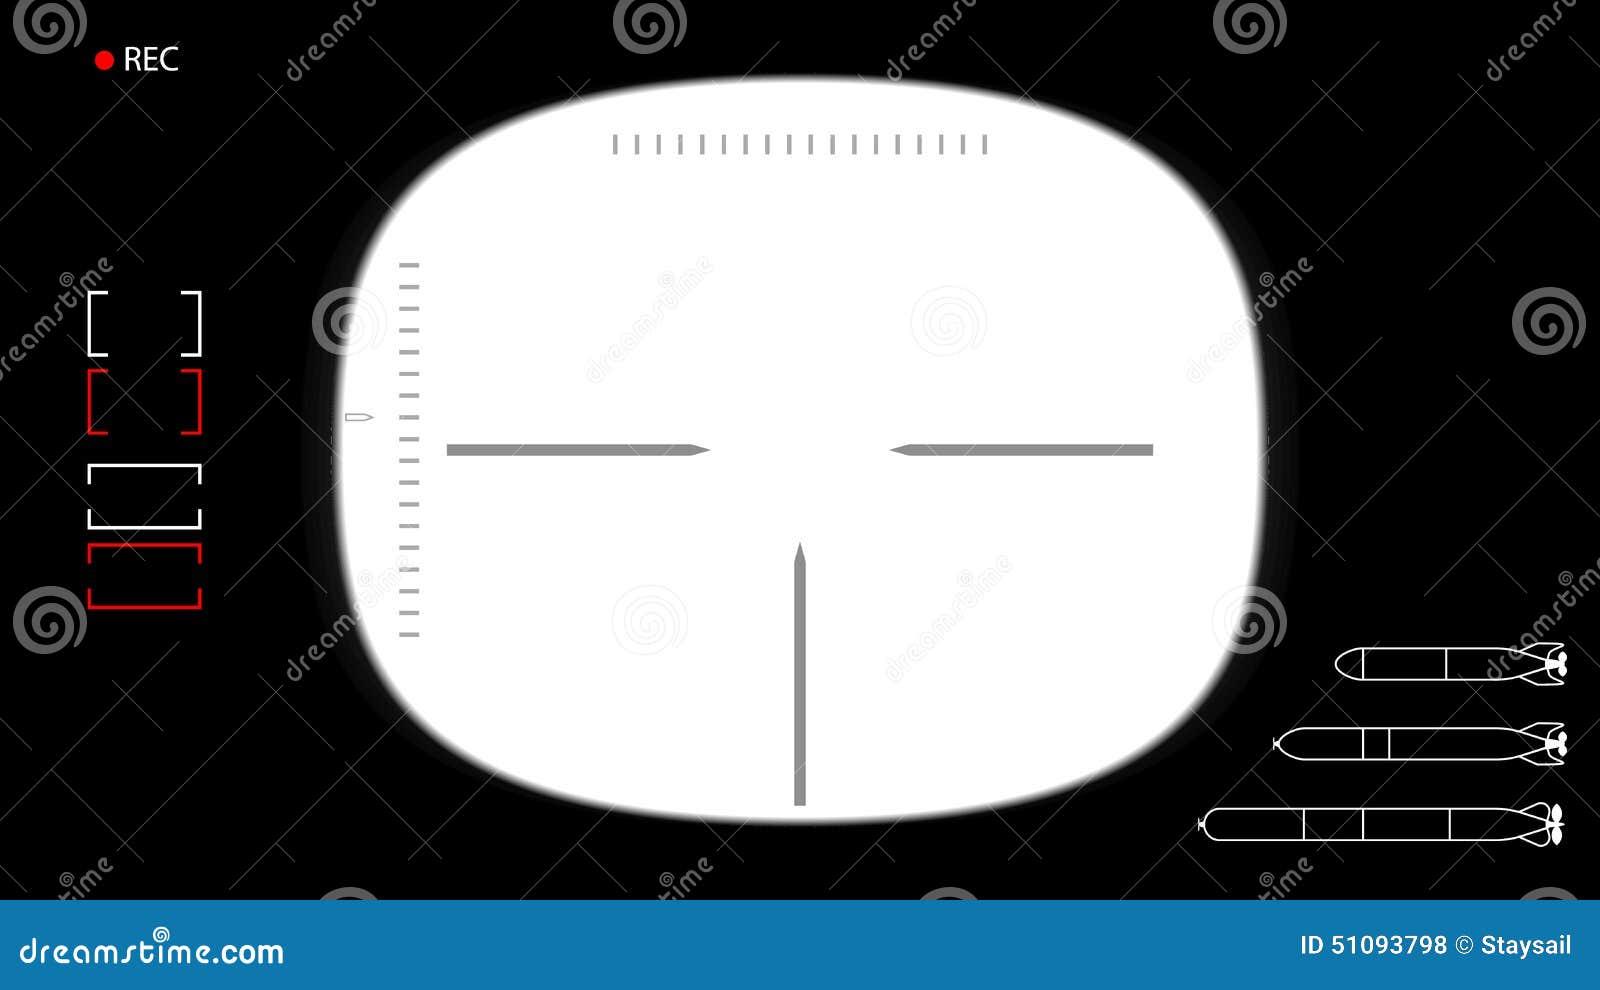 submarine periscope template stock vector illustration of